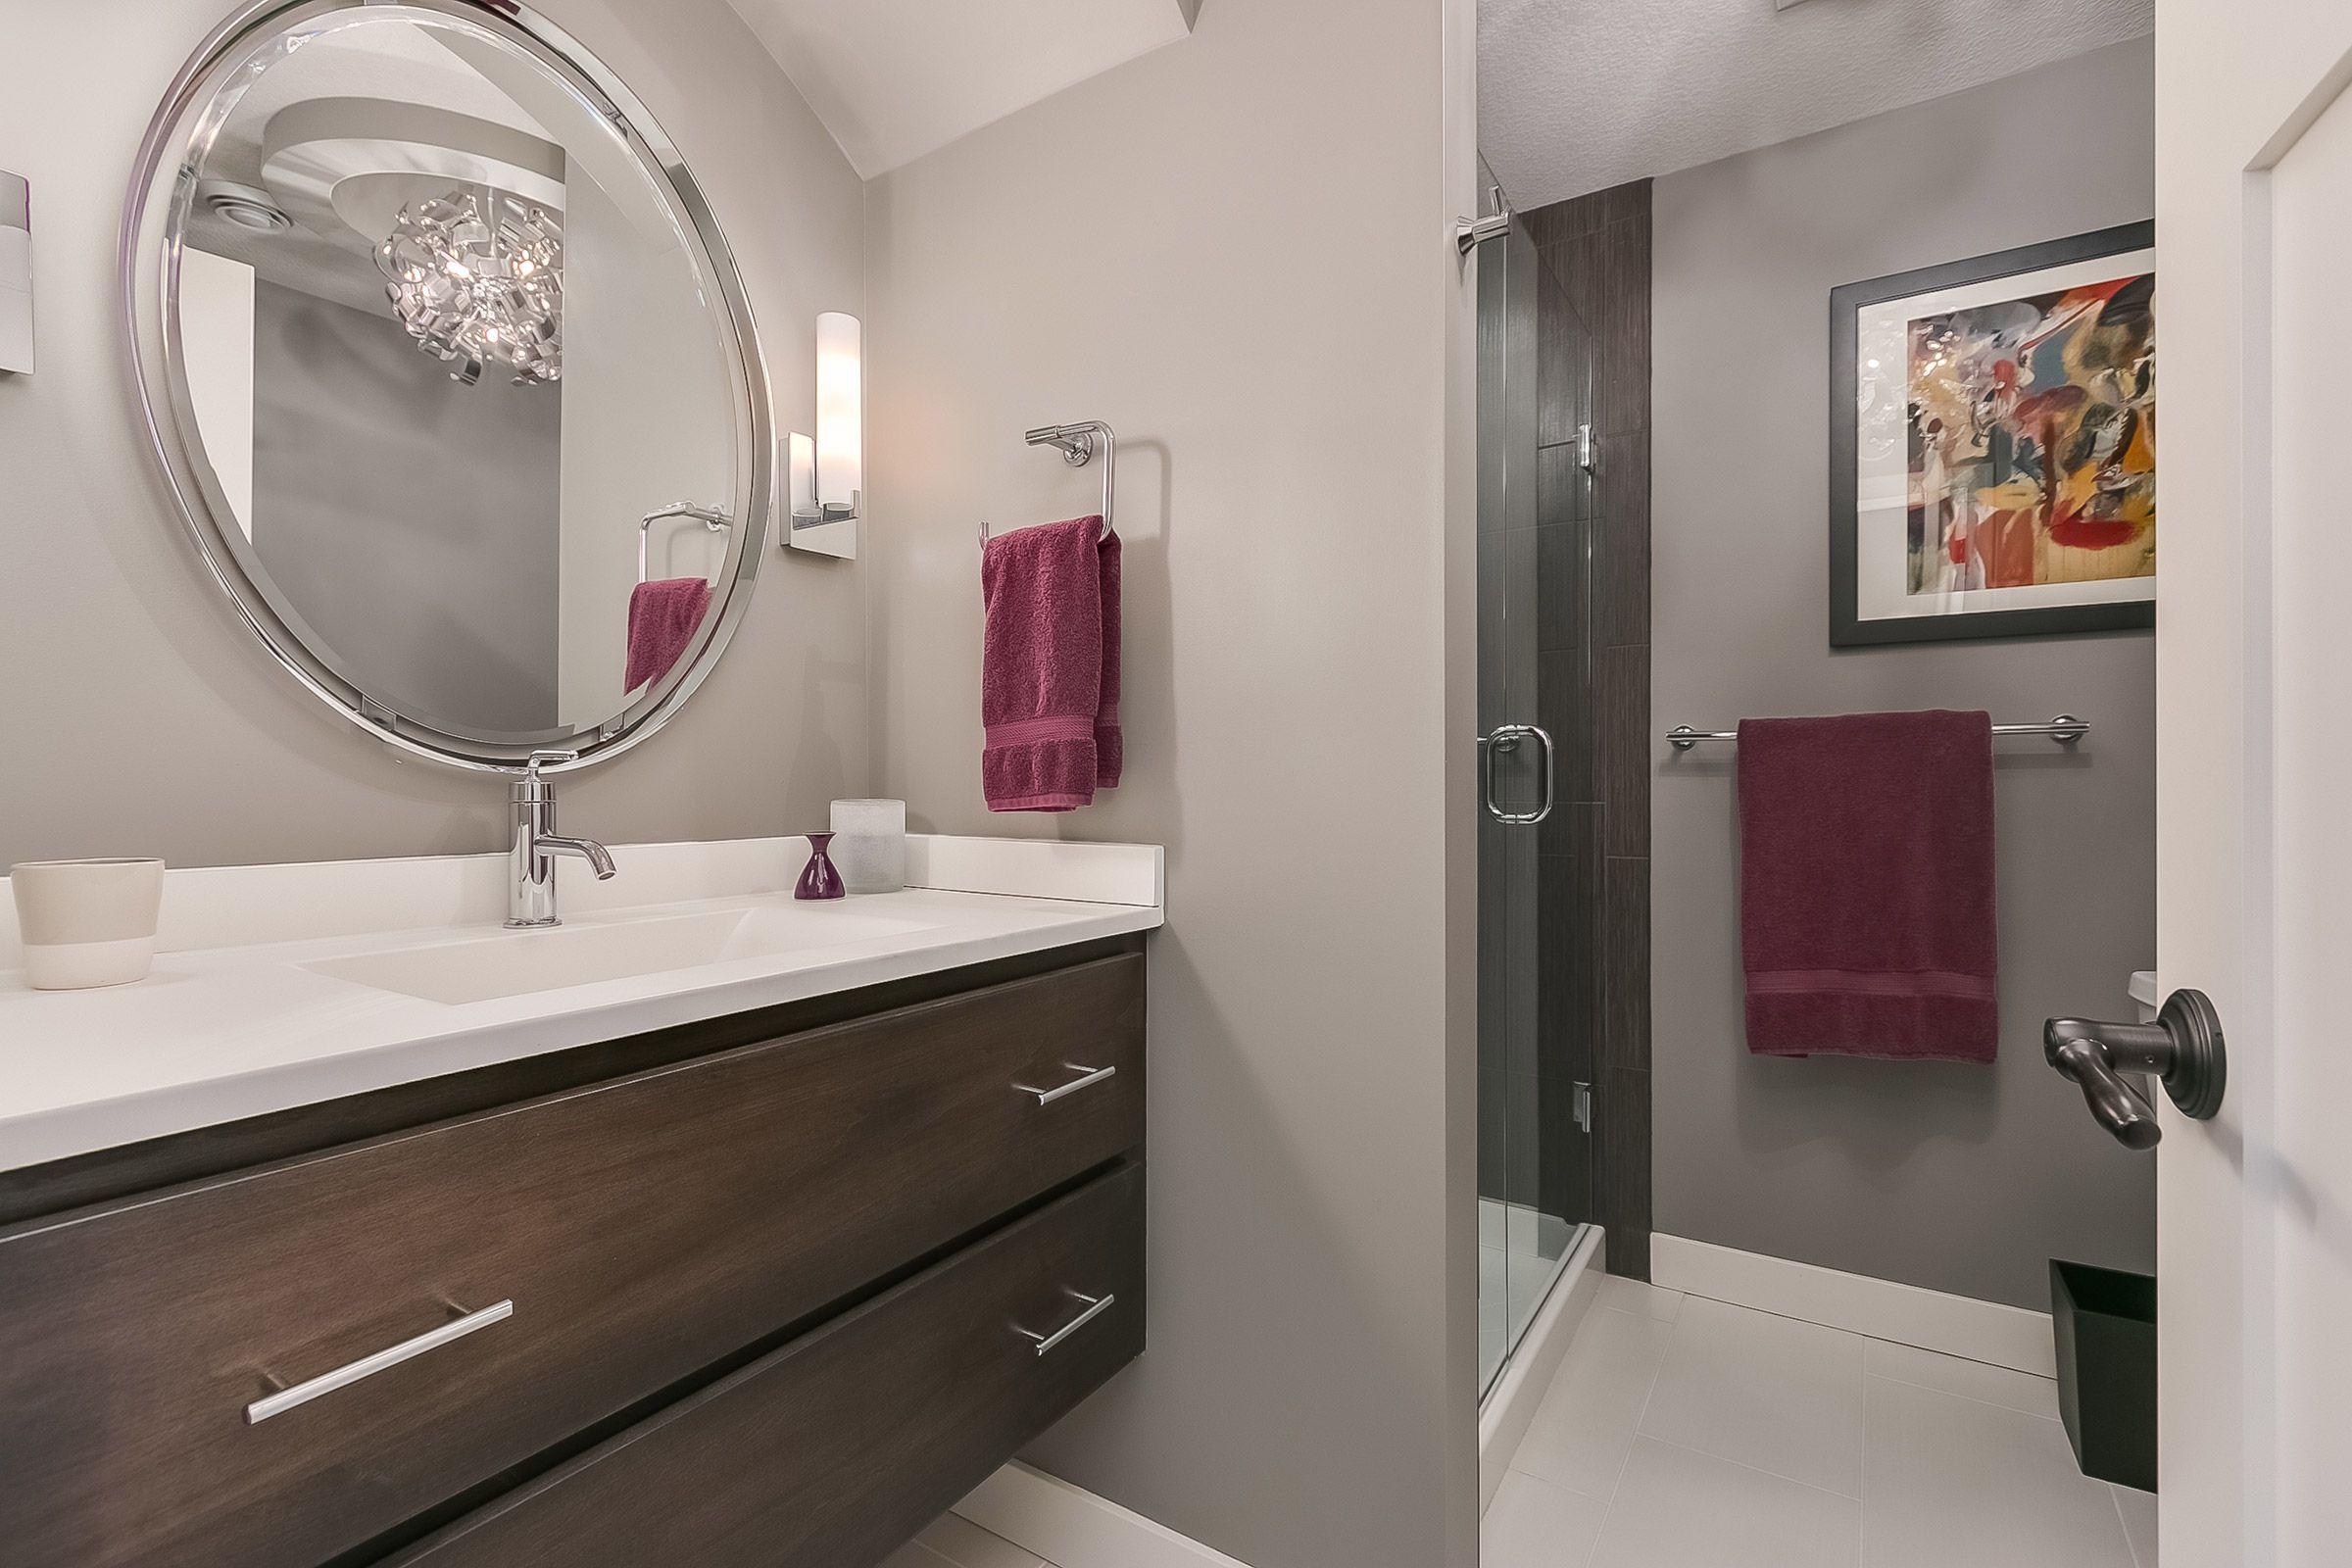 Pin By Finished Basement Company On Basement Bed Bath Pinterest - Bathroom vanity brooklyn